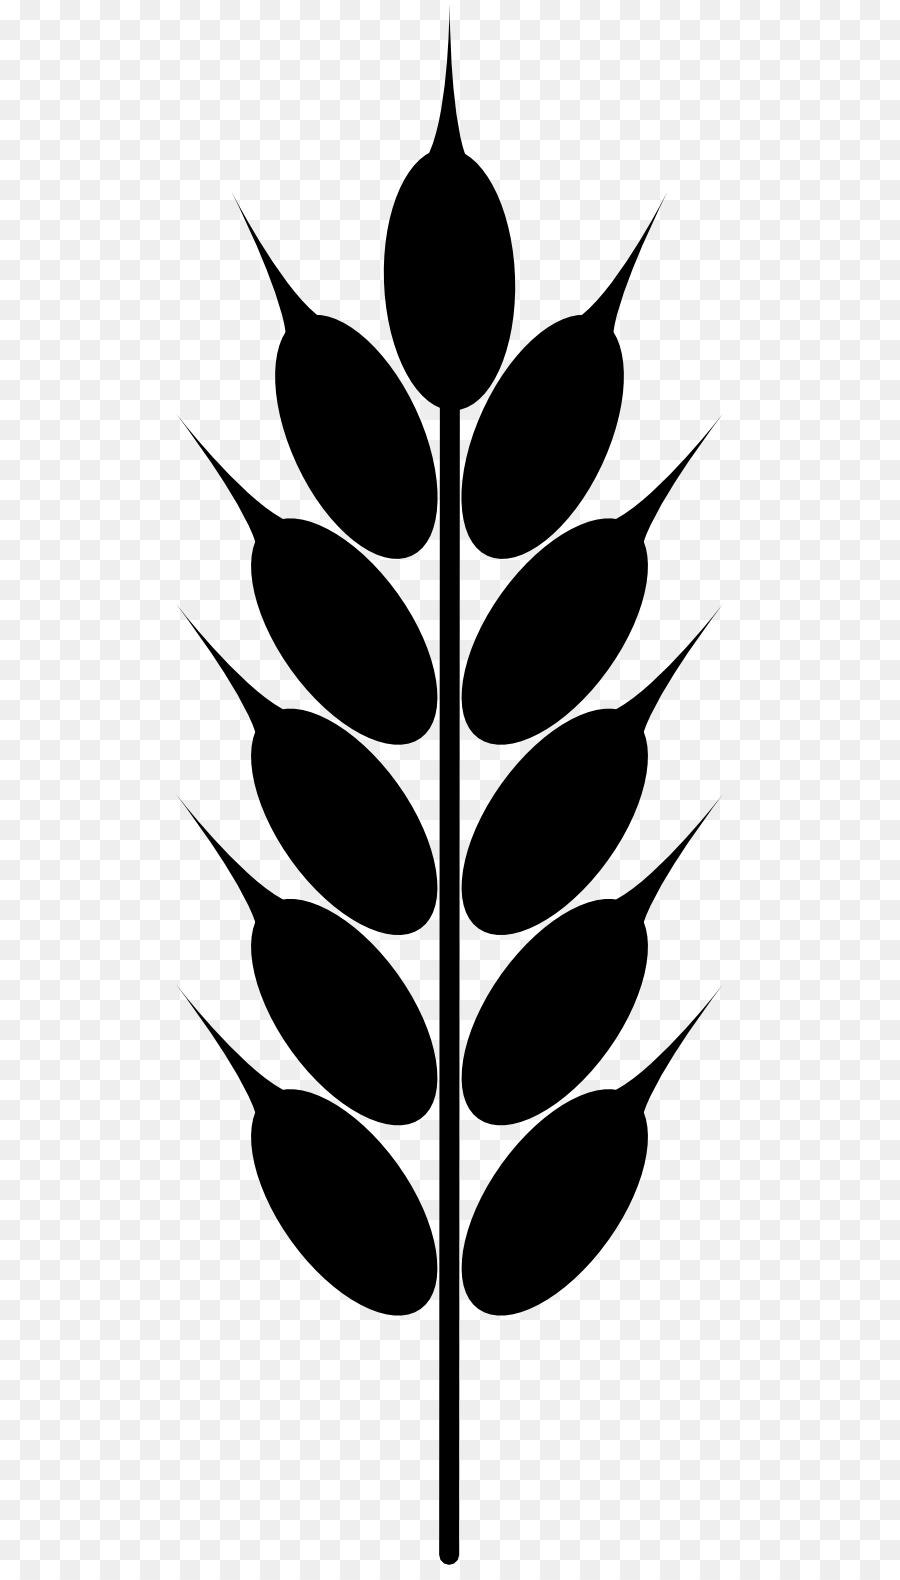 wheat ear grain clip art wheat cliparts png download 555 1569 rh kisspng com grain clipart png grain clipart black and white